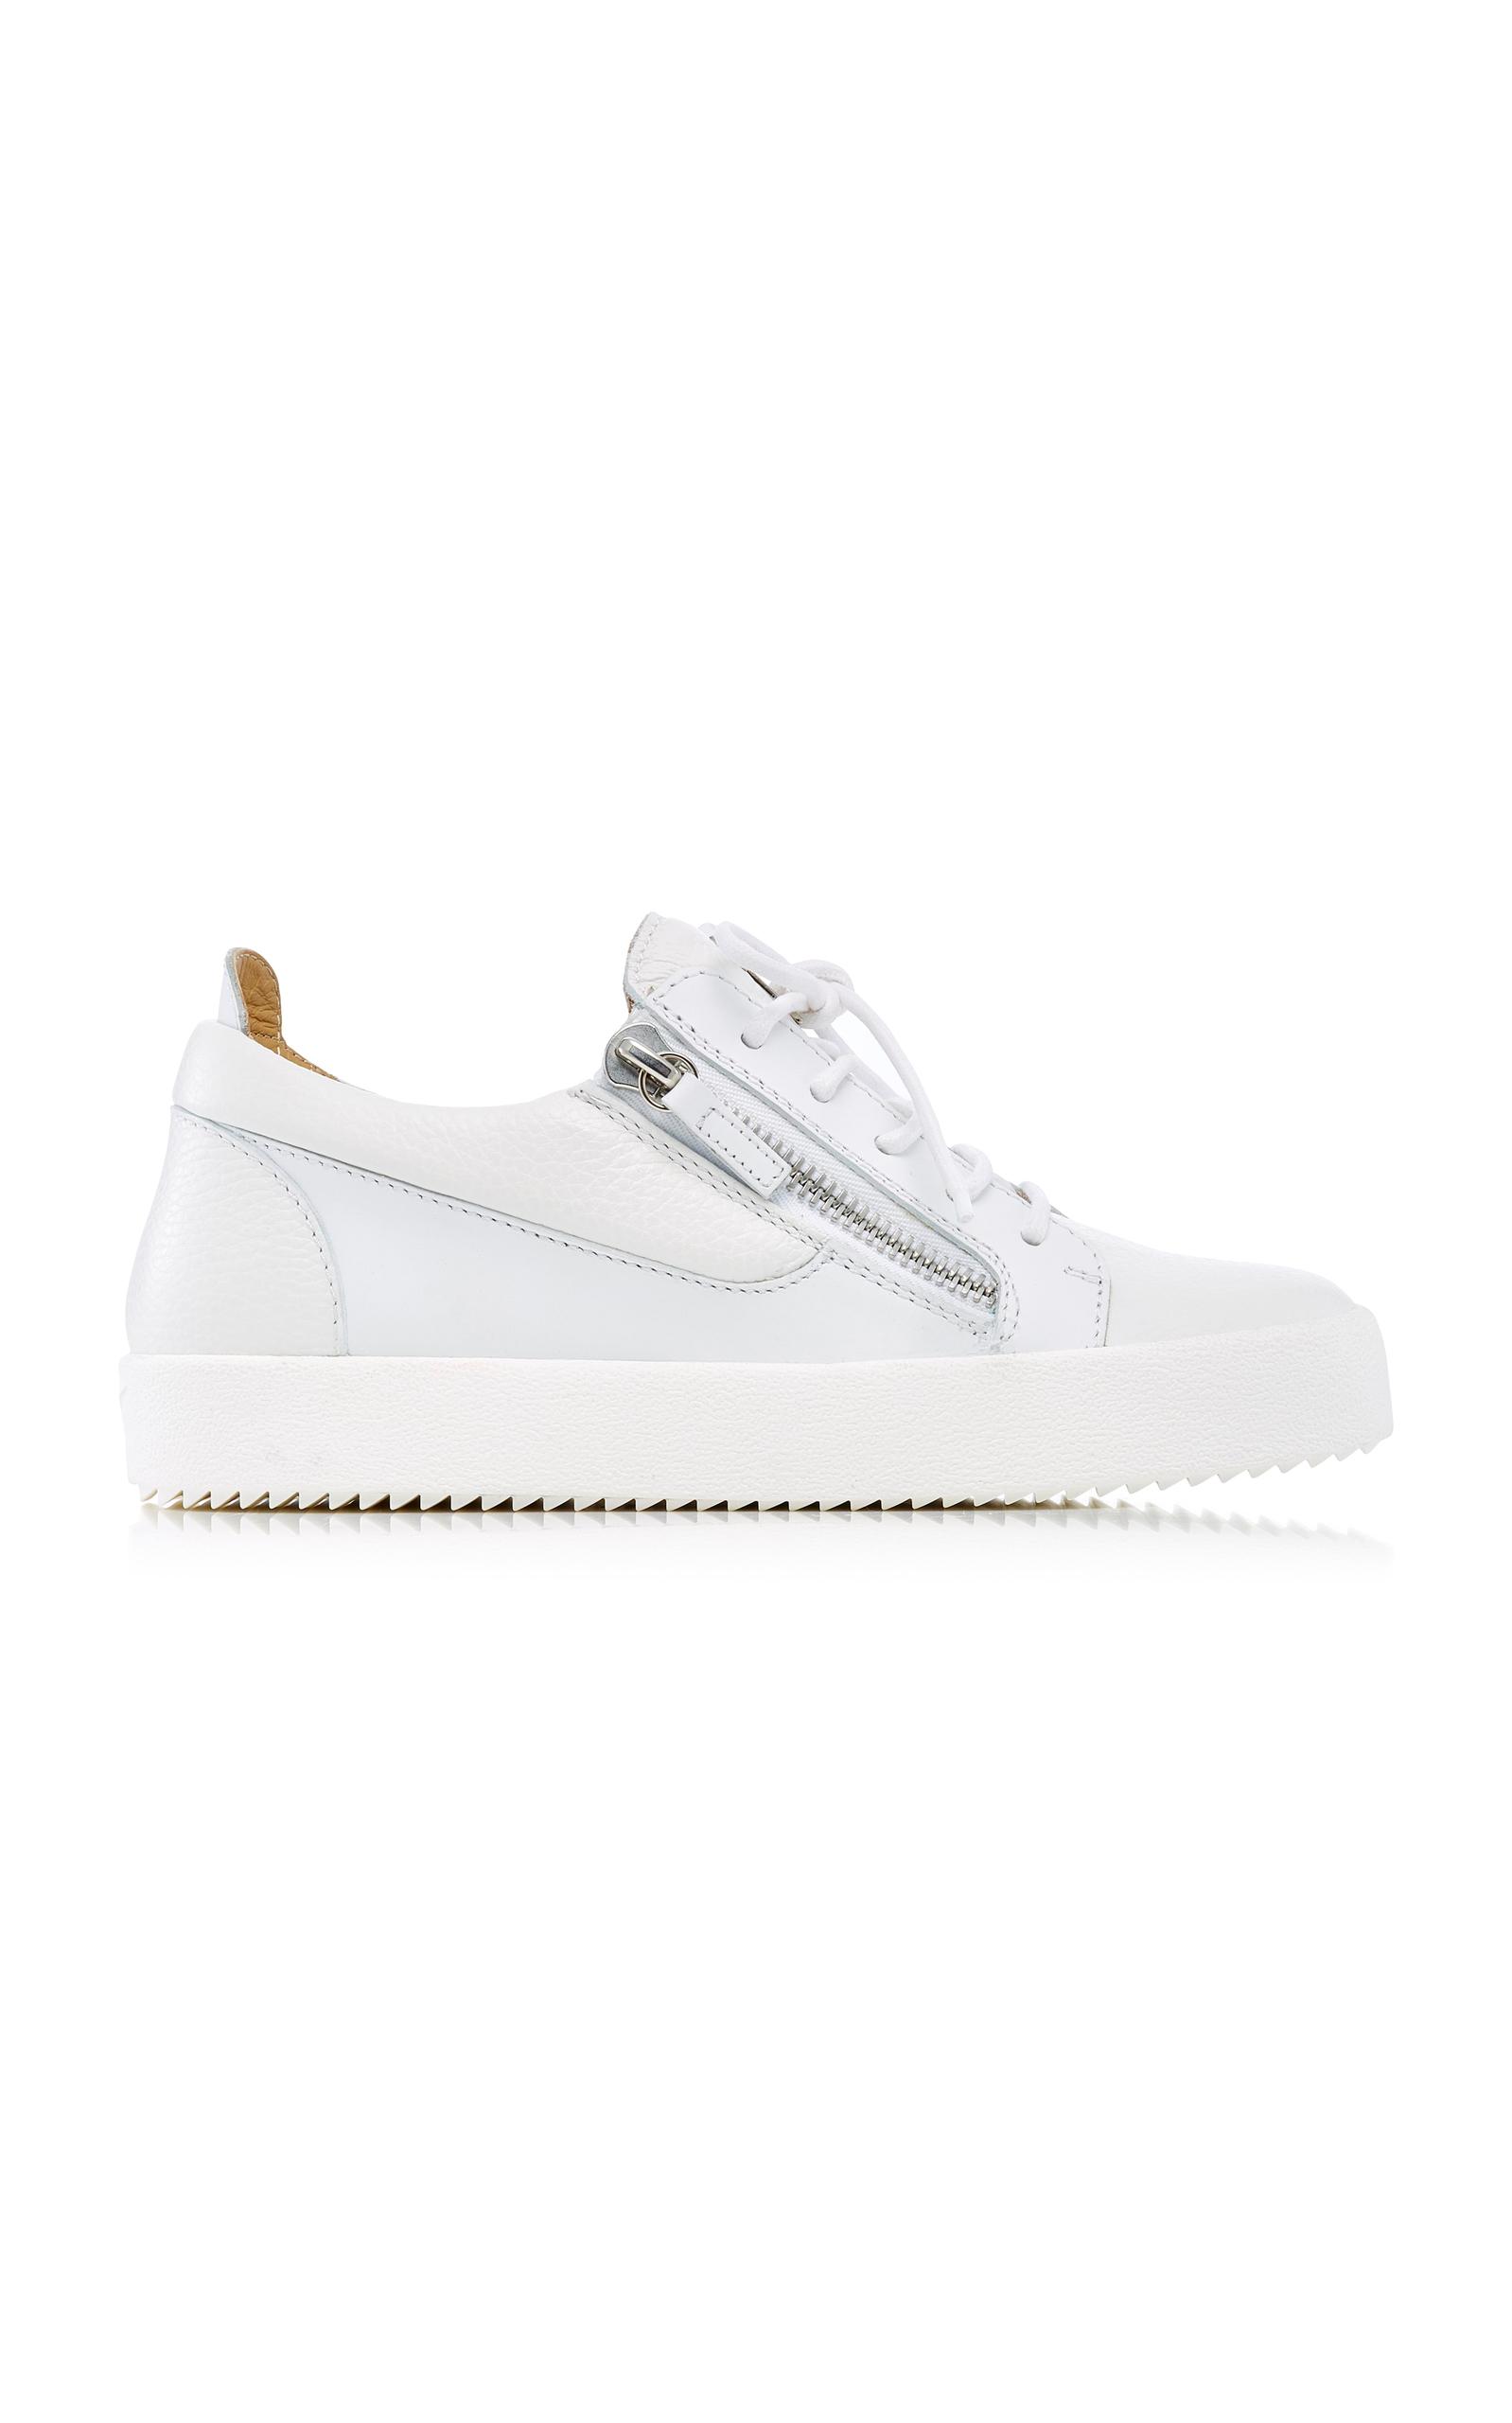 ffb0a4c2d094d May London Leather Sneakers by Giuseppe Zanotti | Moda Operandi